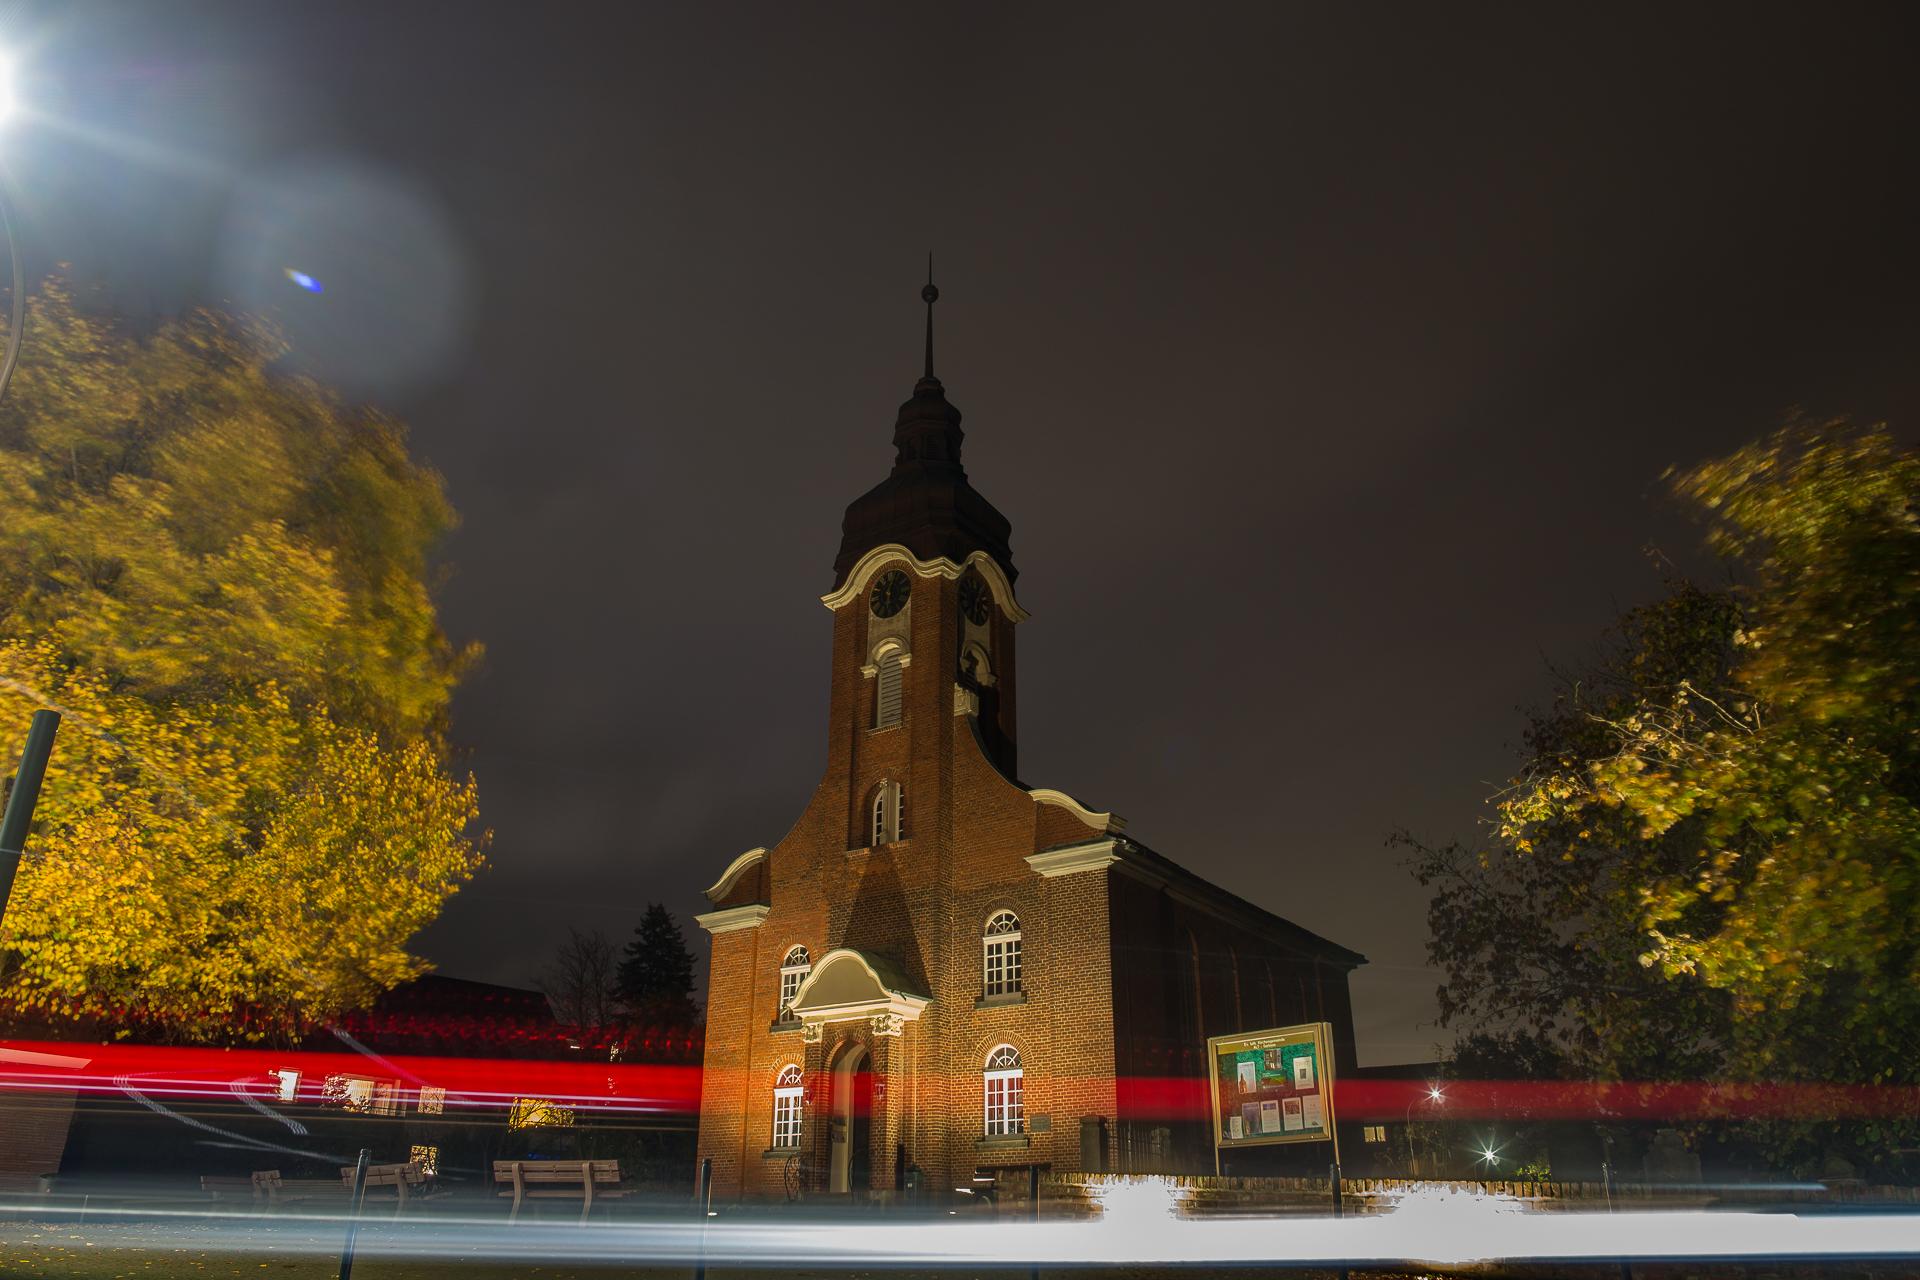 Dorfkirche Altgarbsen